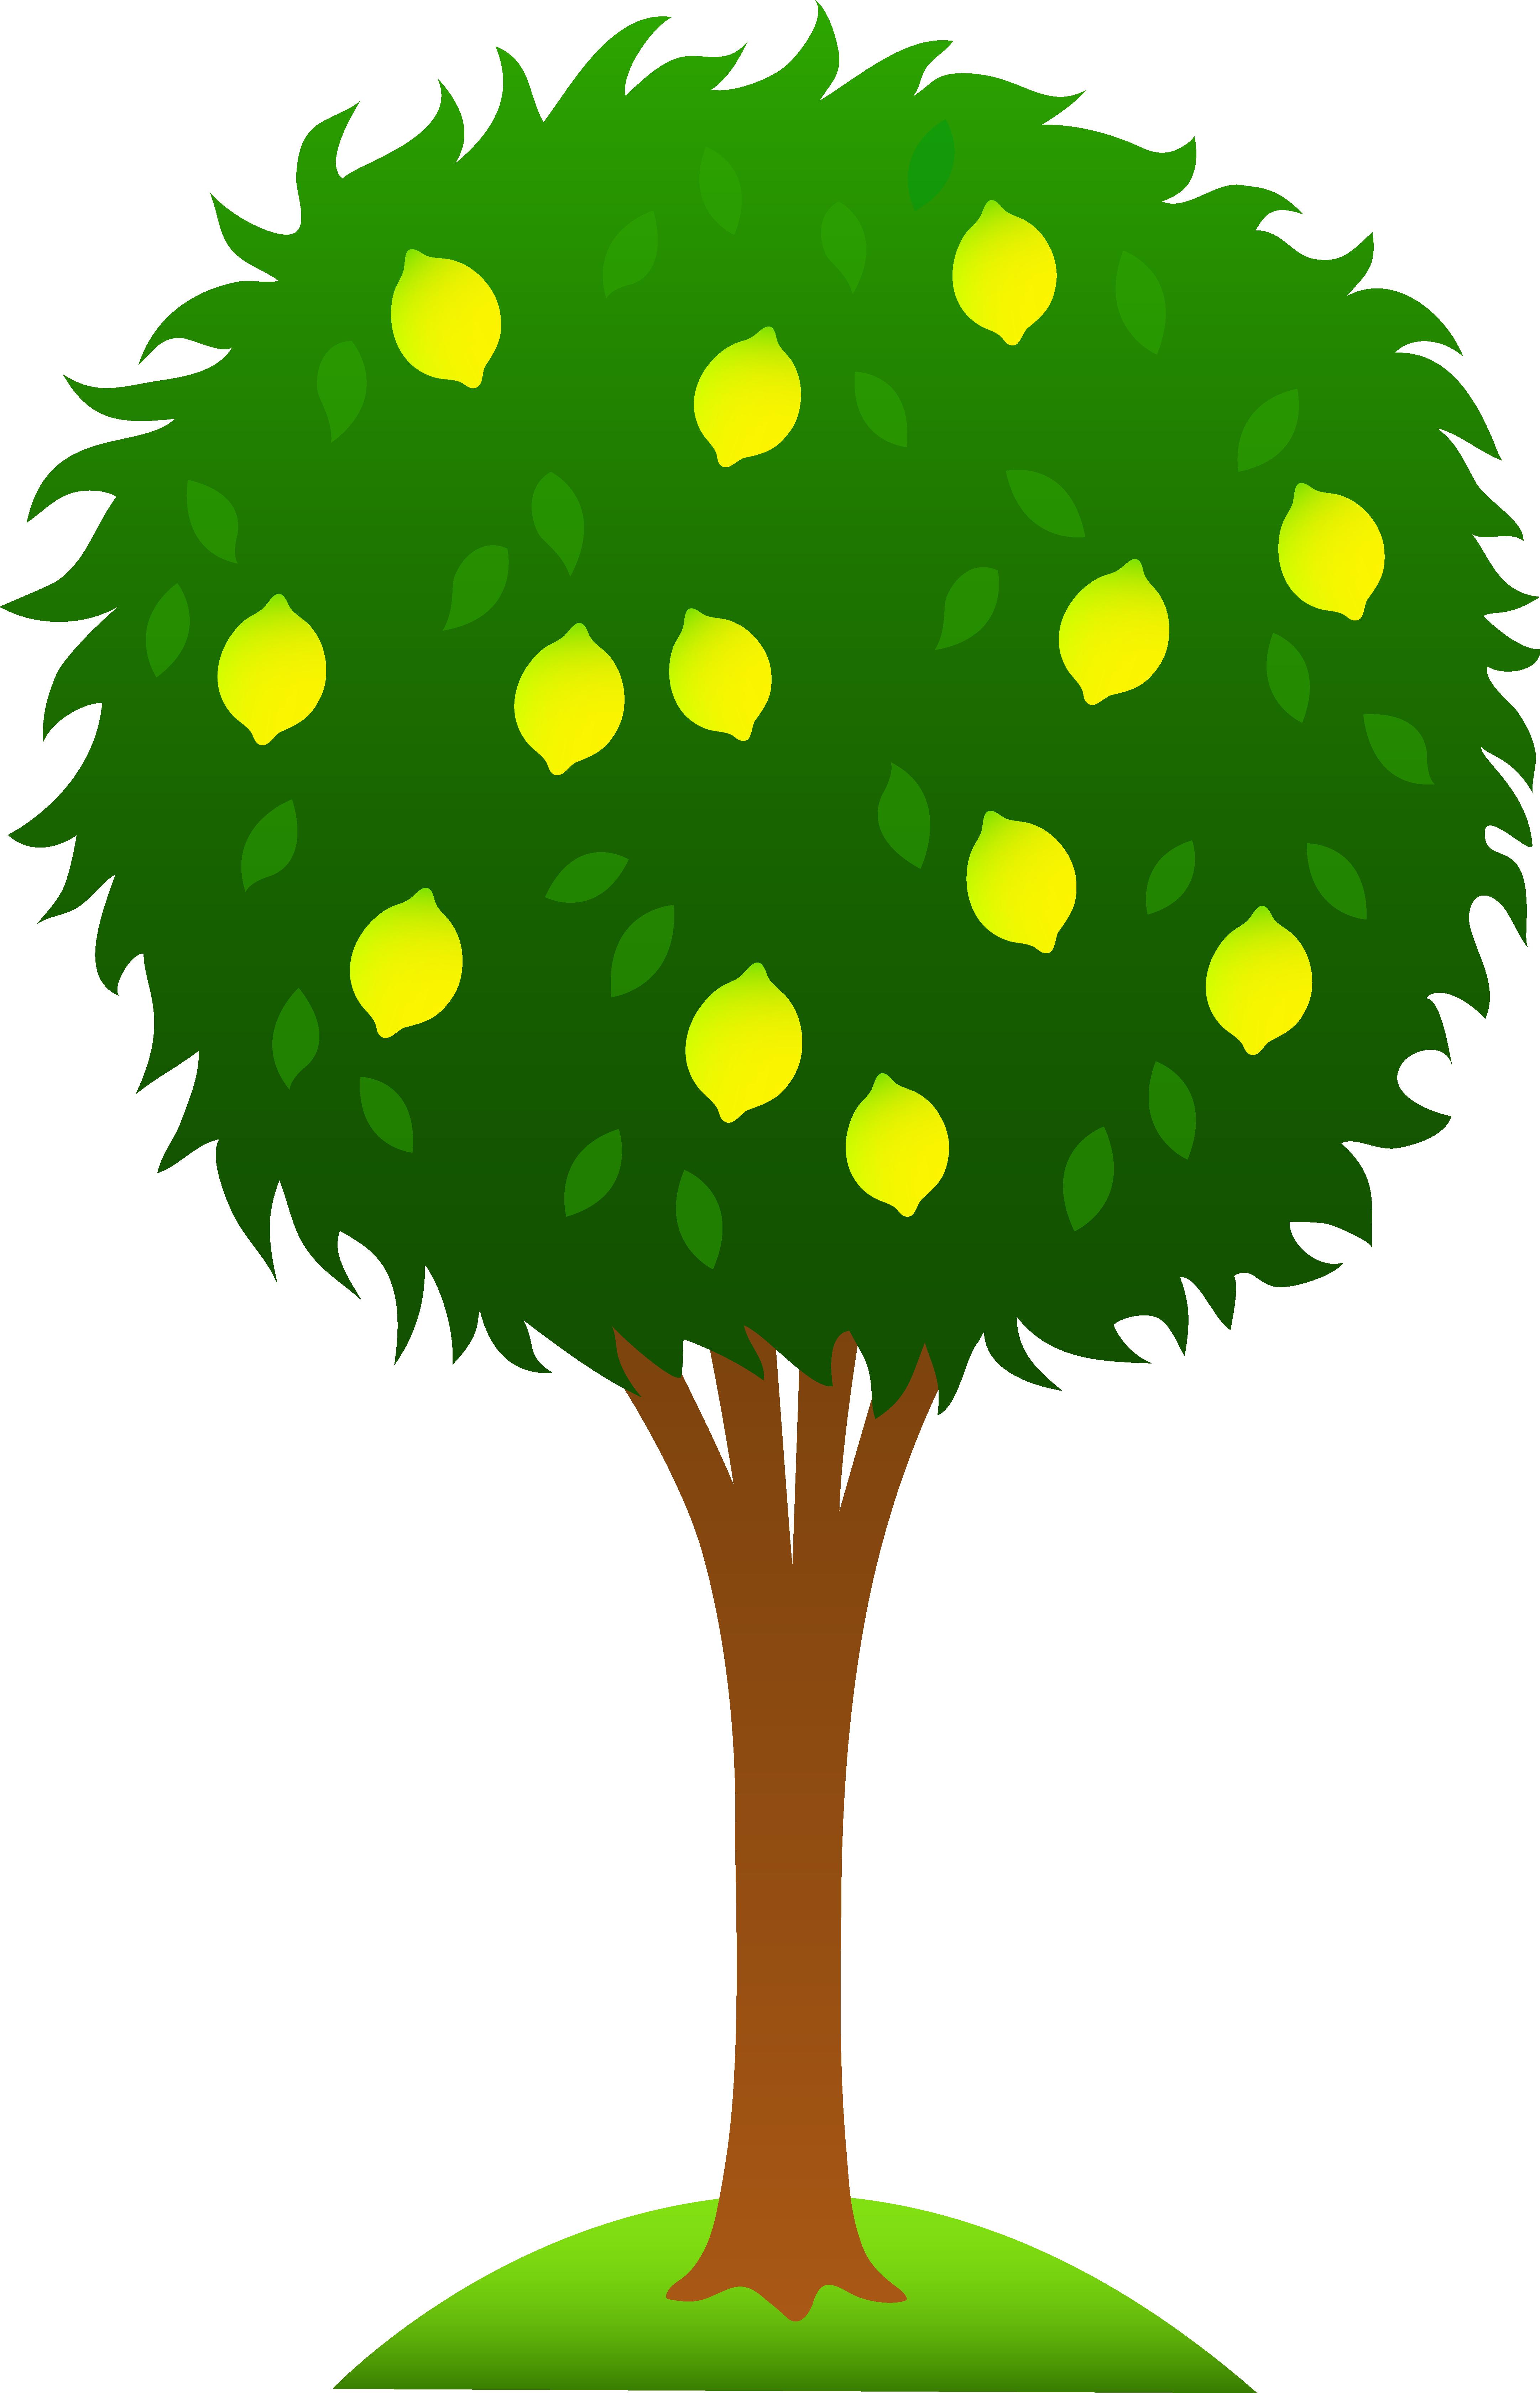 magic tree house pdf free download